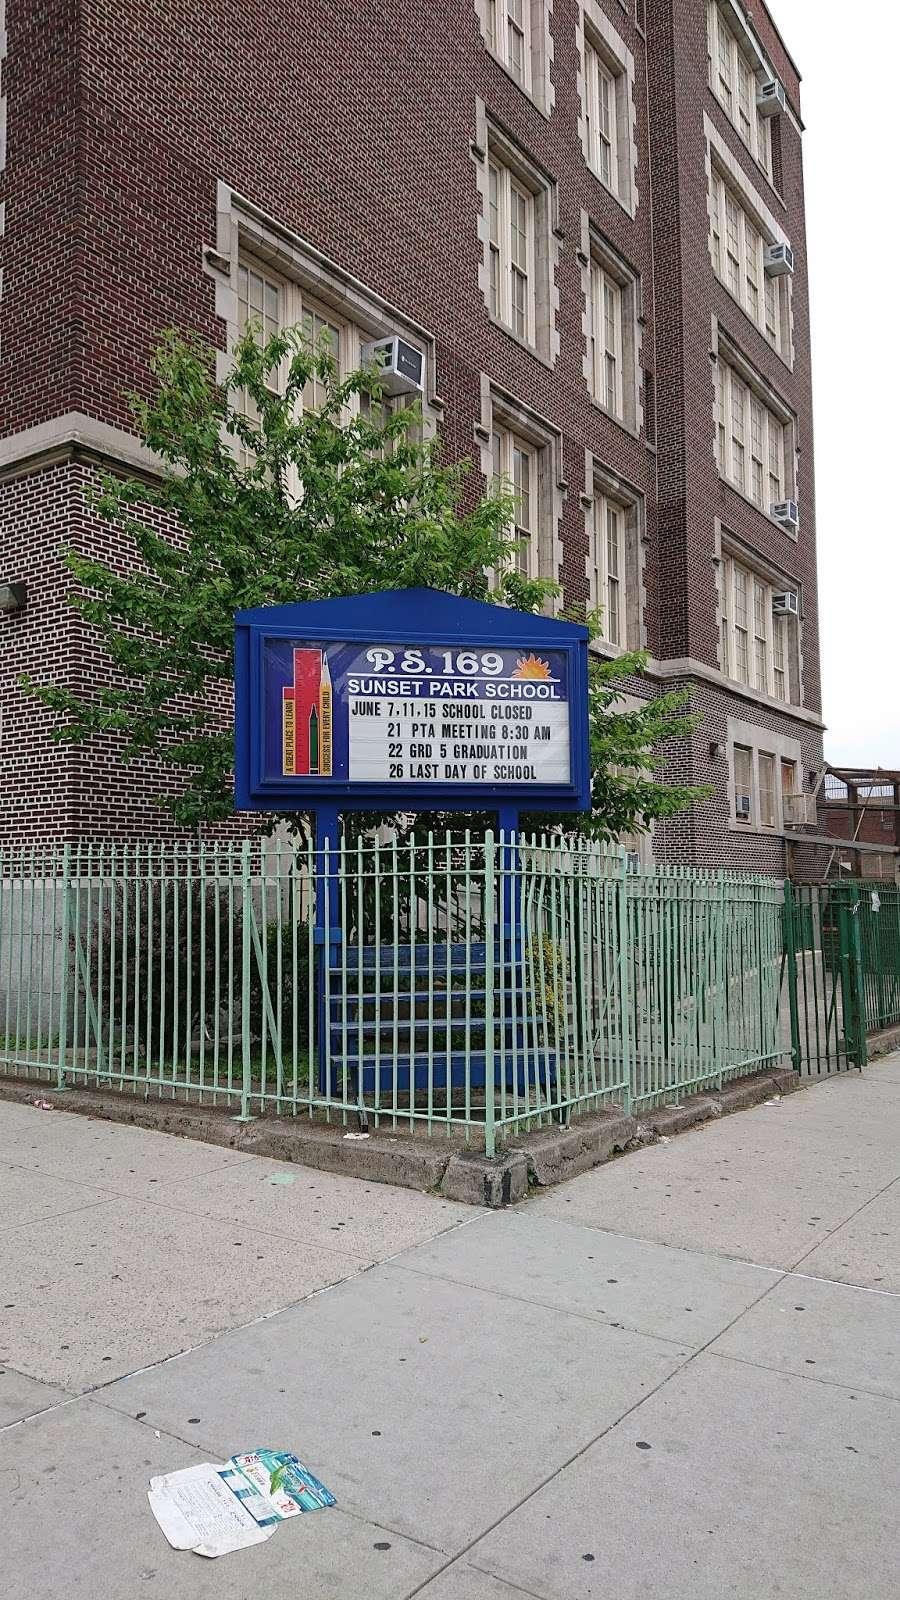 Sunset Park School - school  | Photo 3 of 10 | Address: 4305 7th Ave, Brooklyn, NY 11232, USA | Phone: (718) 853-3224